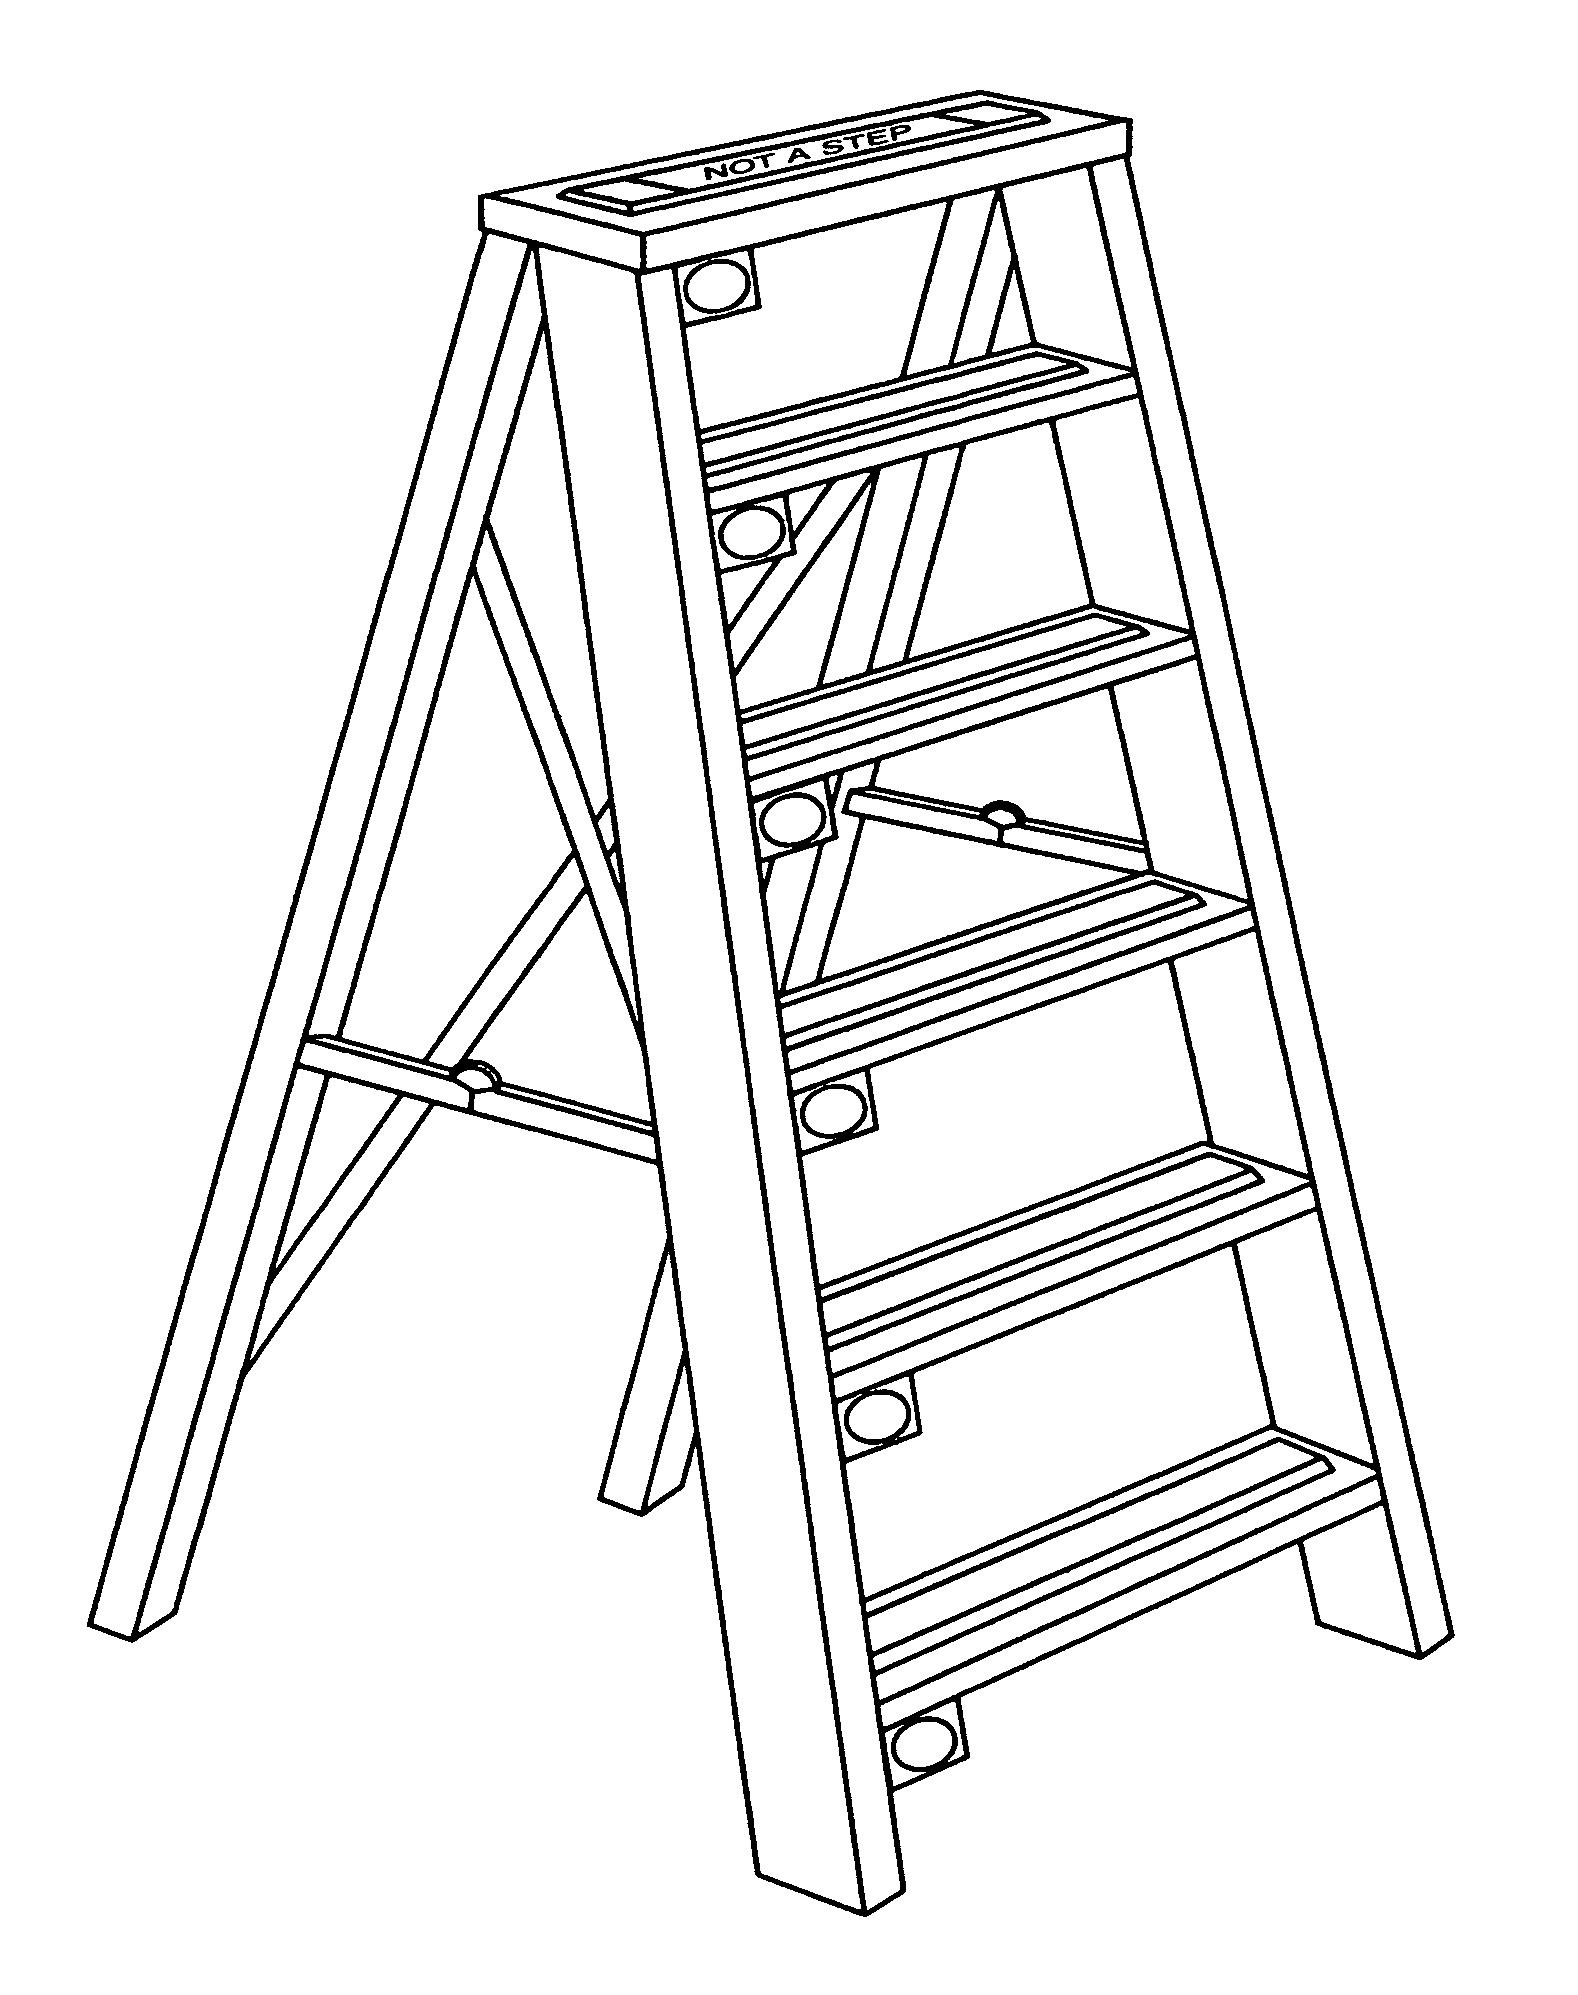 Ladder Drawing At Getdrawings